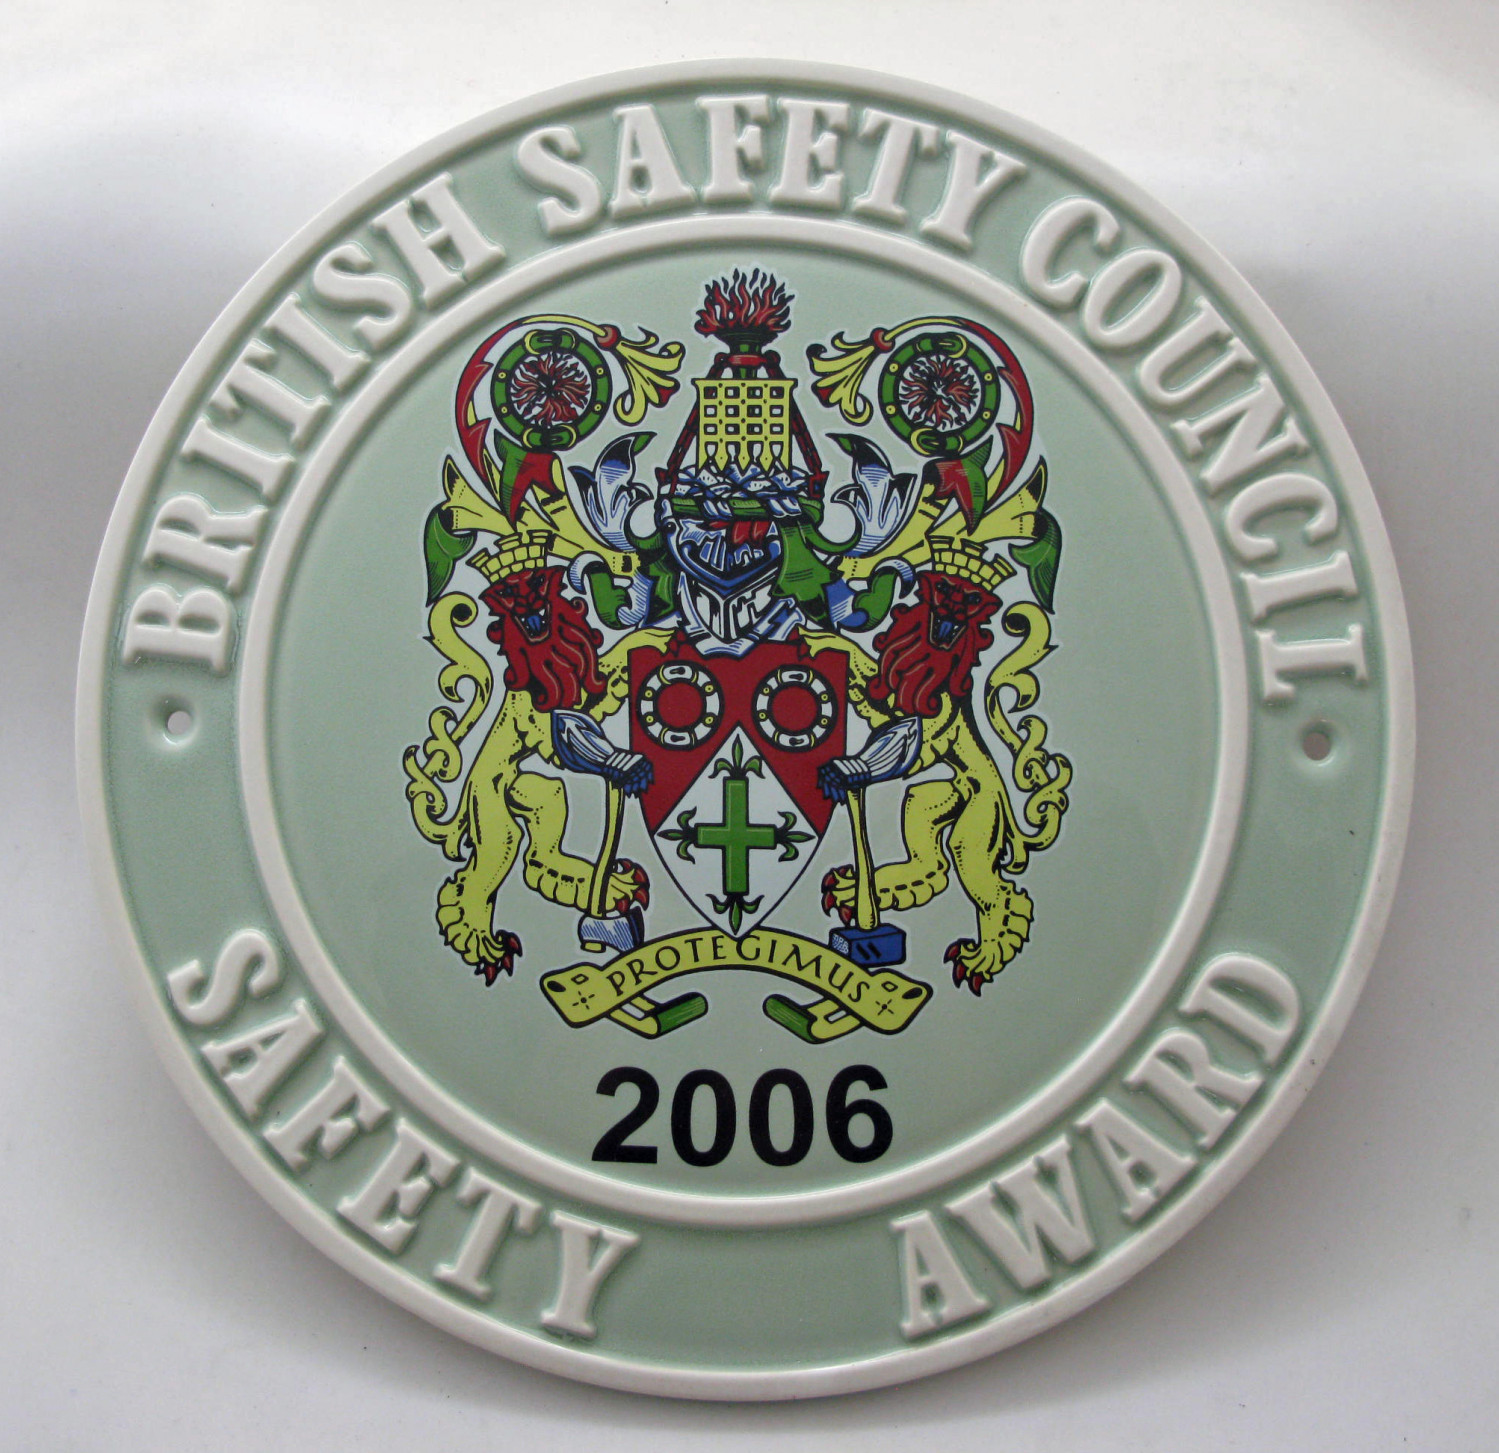 2006 Safety Award Plaque